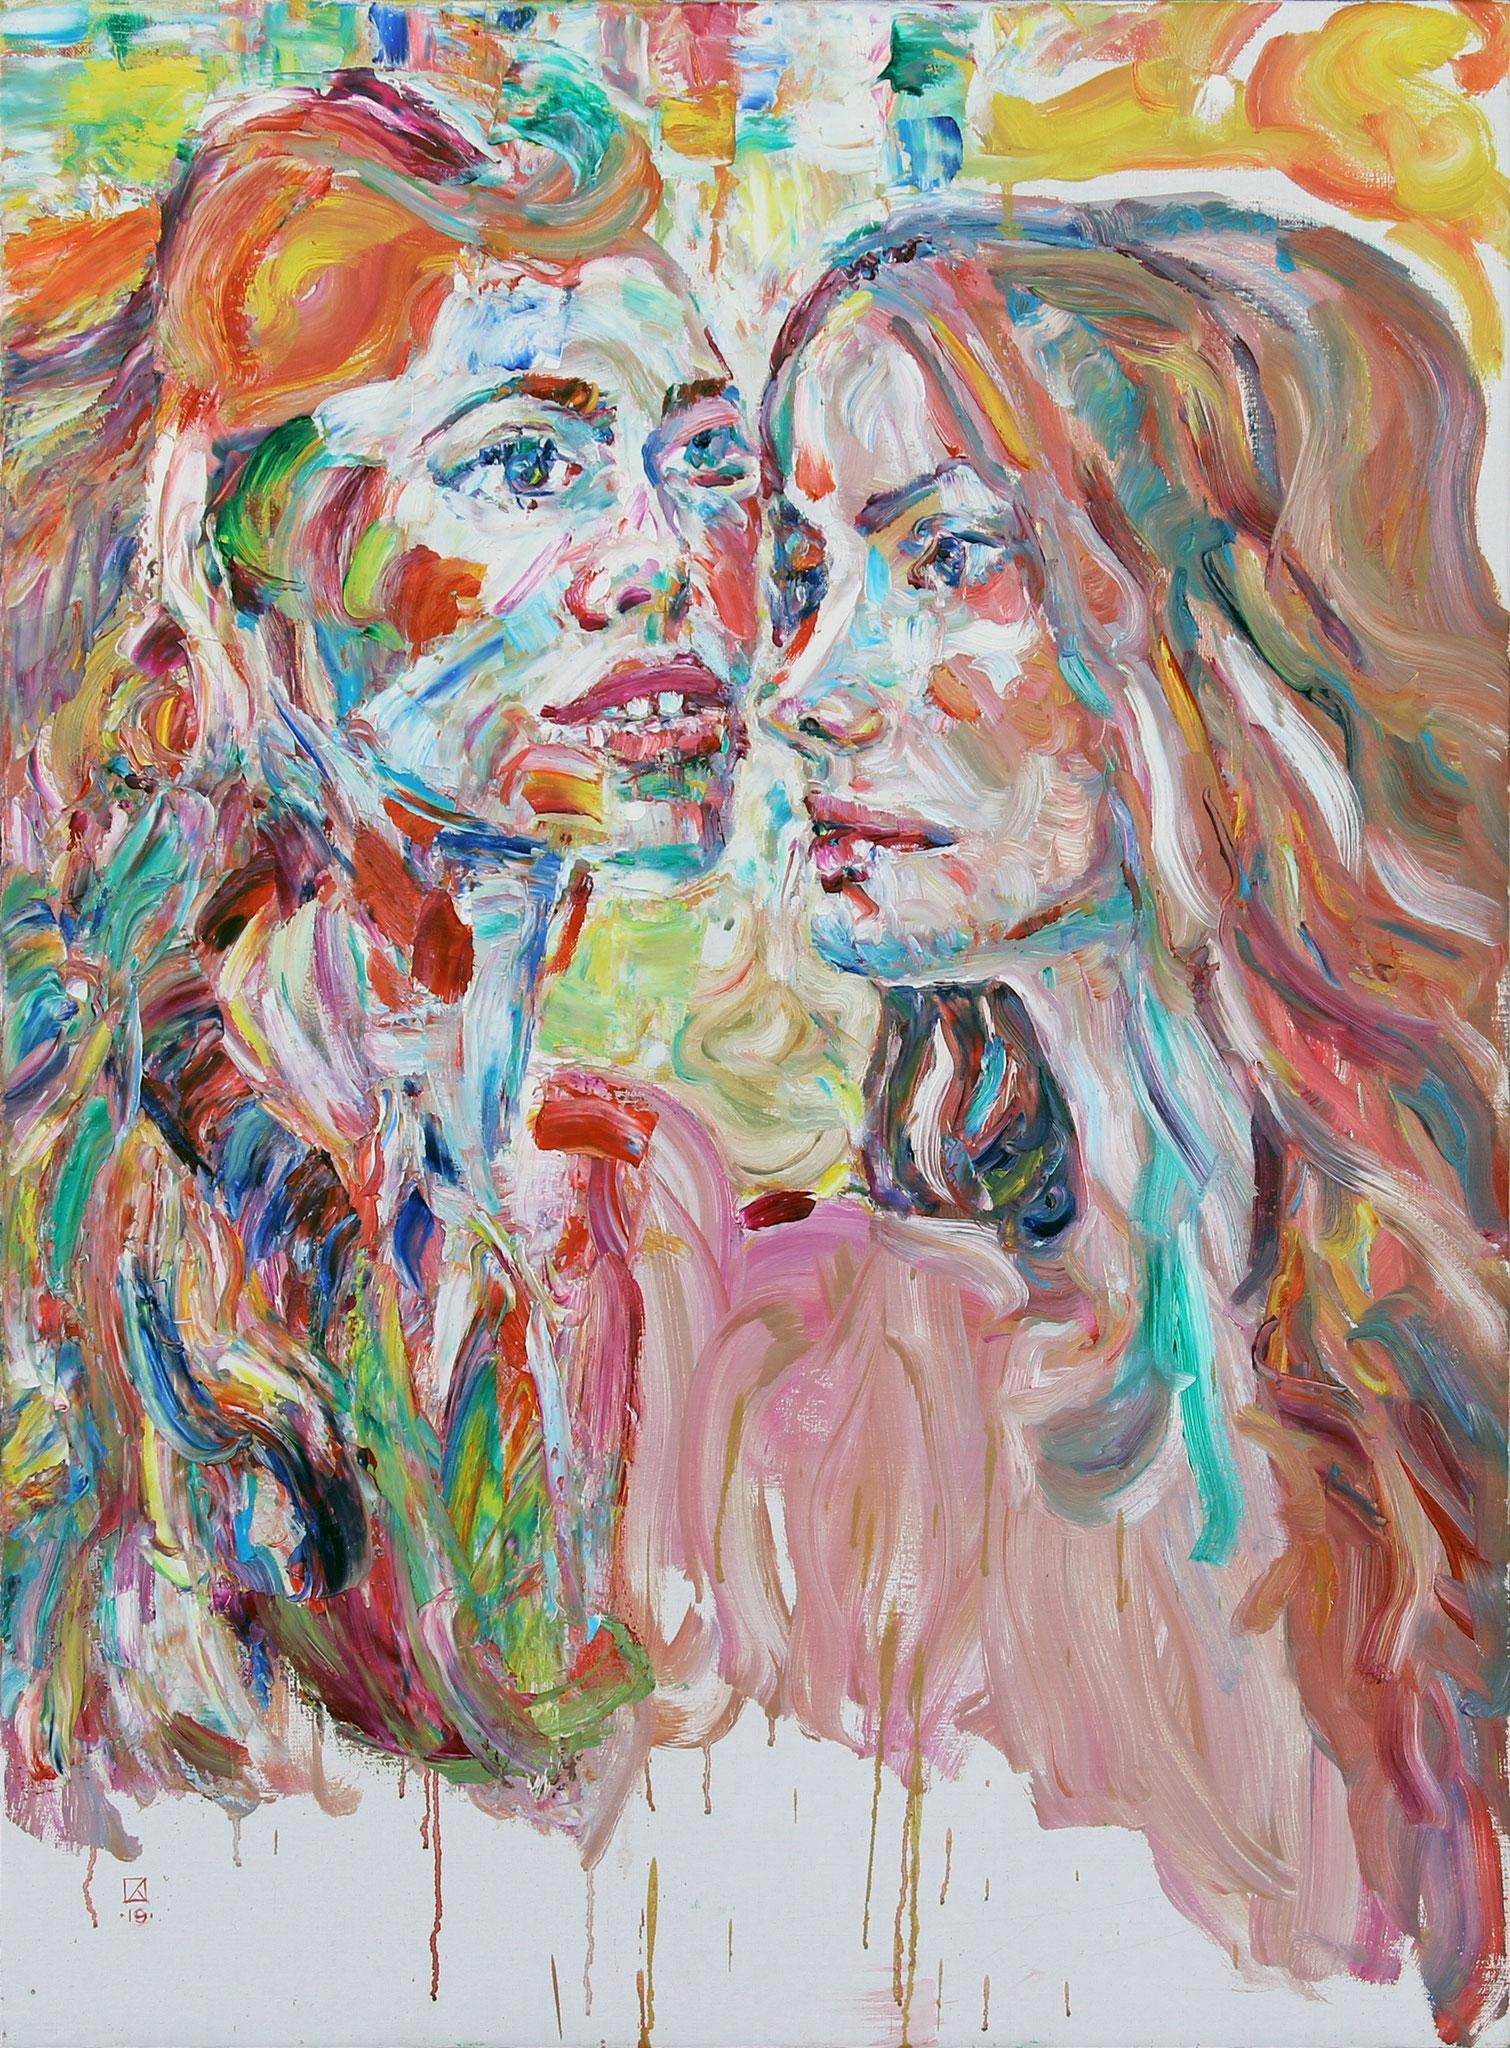 Twee Jonge Meusjes. Double Portrait. 2019. Oil on canvas. 95 х 70